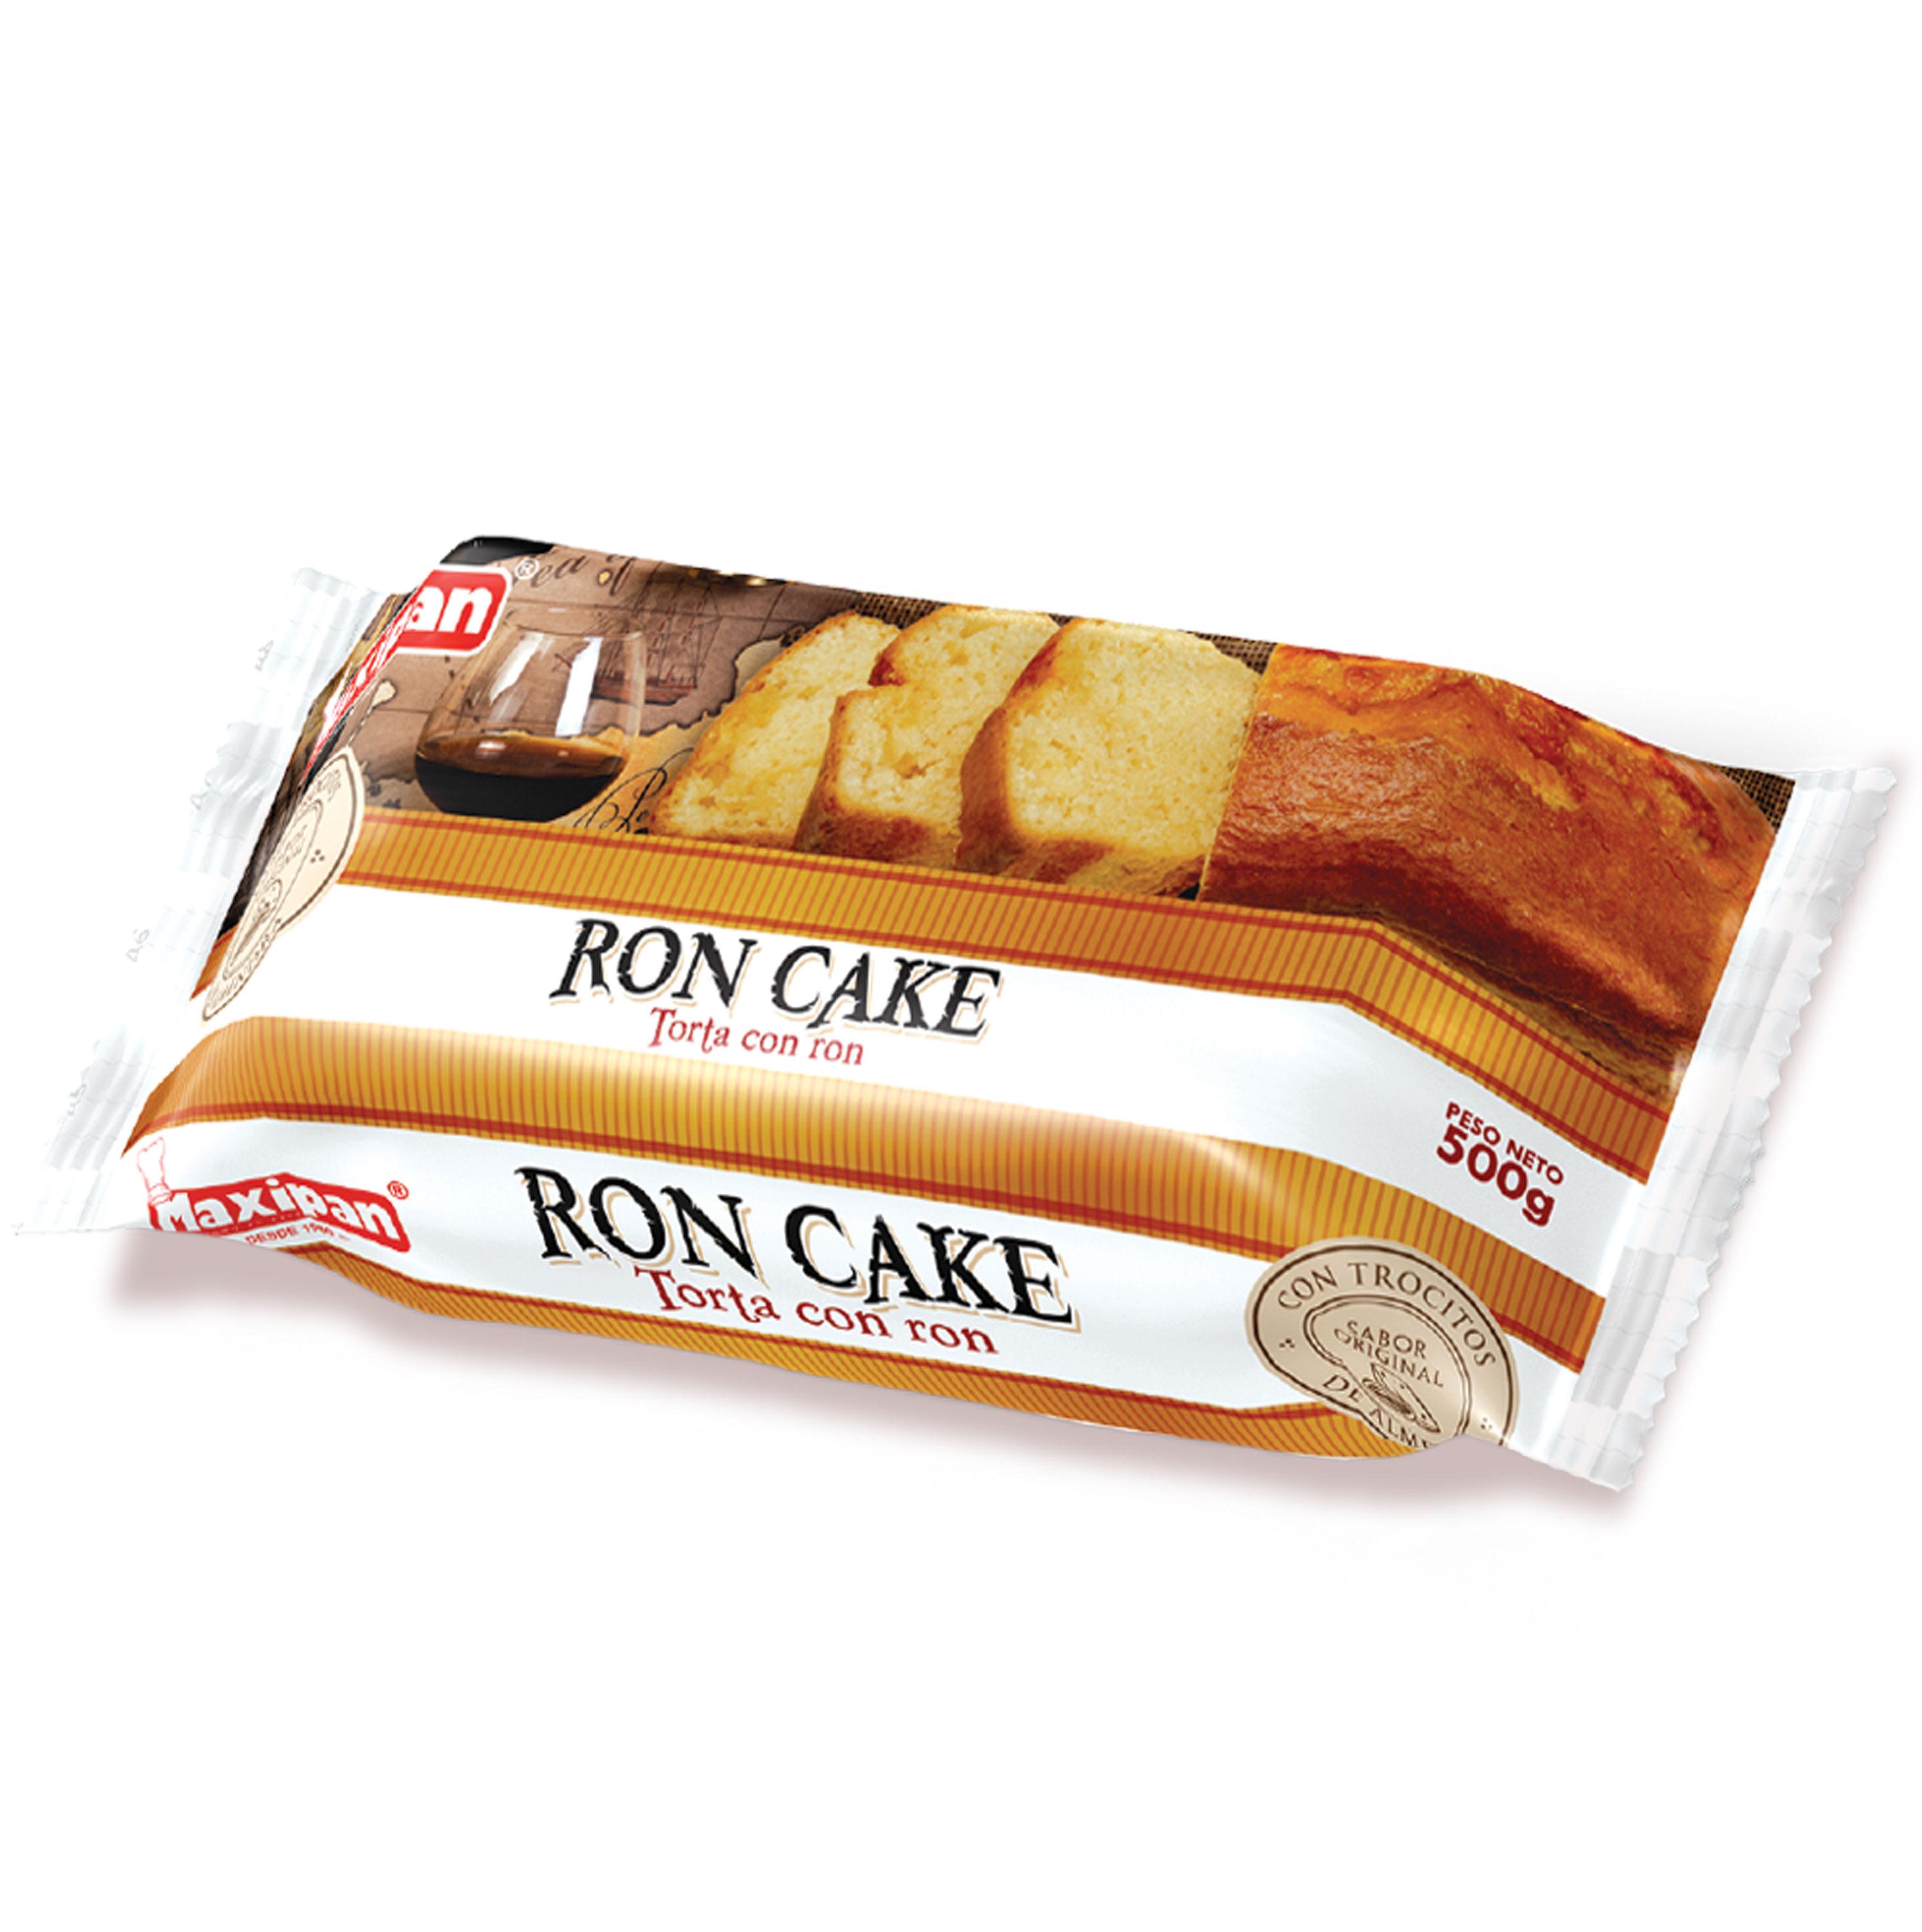 RON CAKE